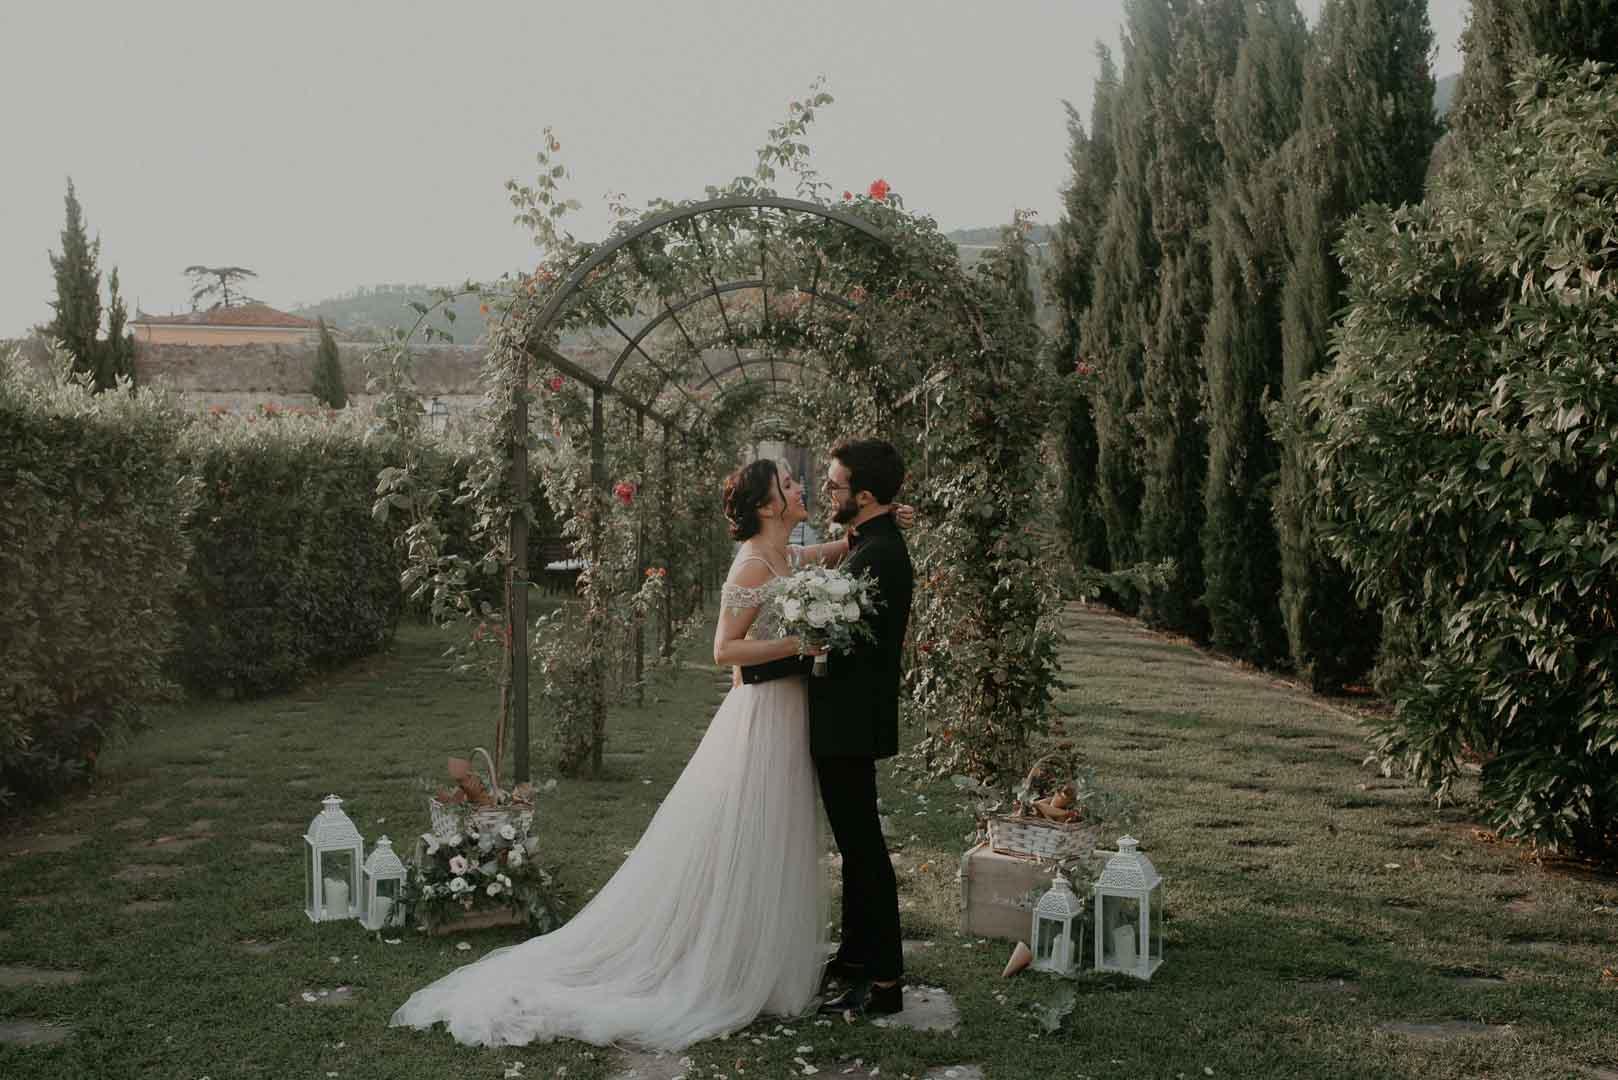 wedding-photographer-destination-fineart-bespoke-reportage-tuscany-villascorzi-vivianeizzo-spazio46-91